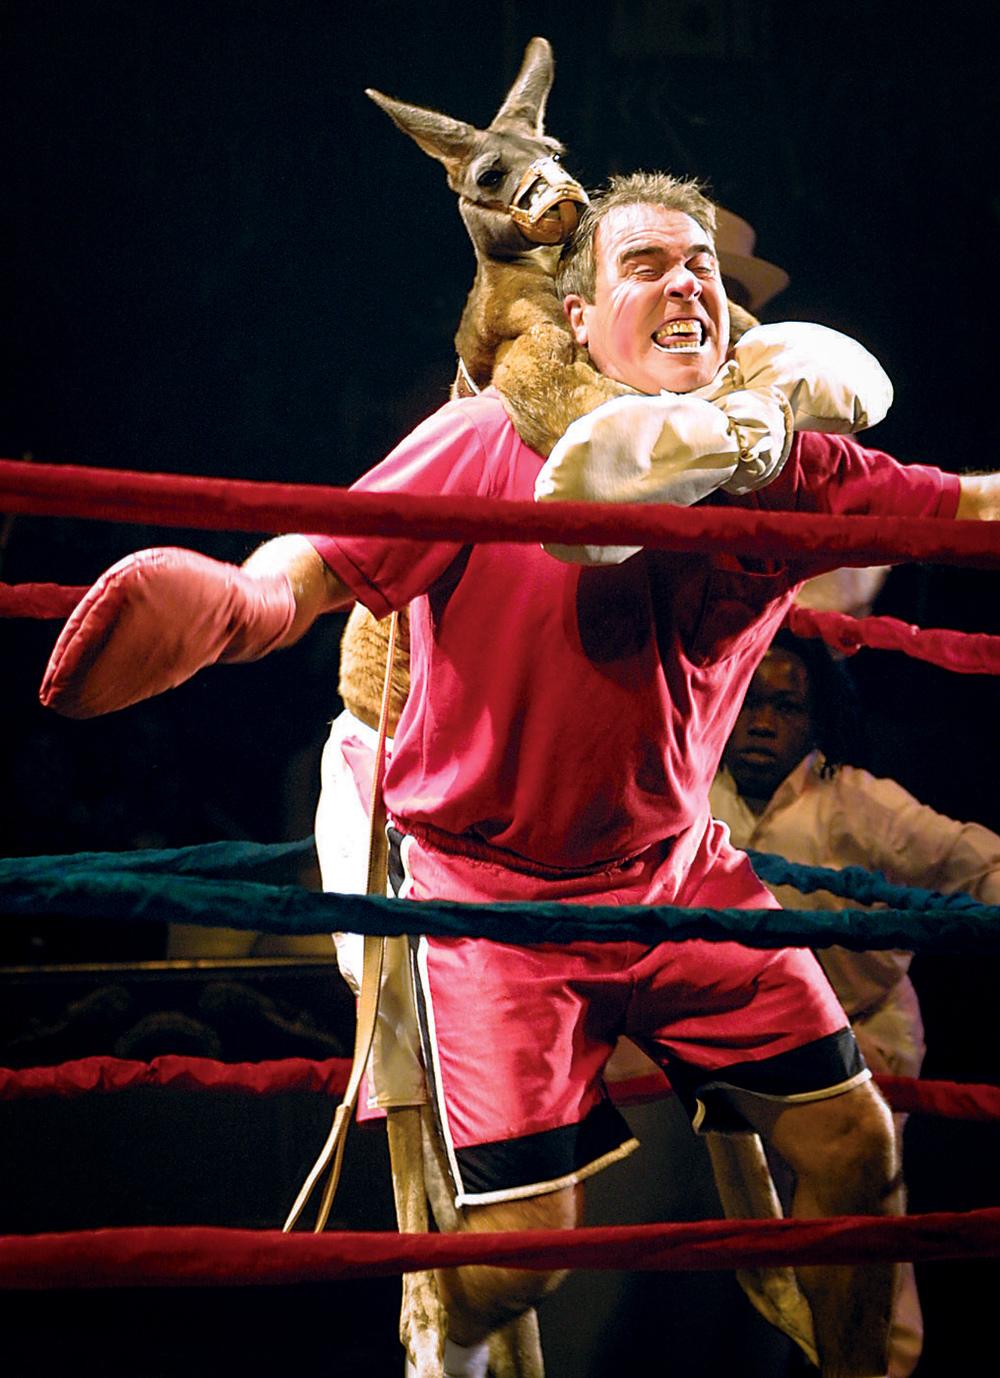 UniverSoul Circus kangaroo boxing